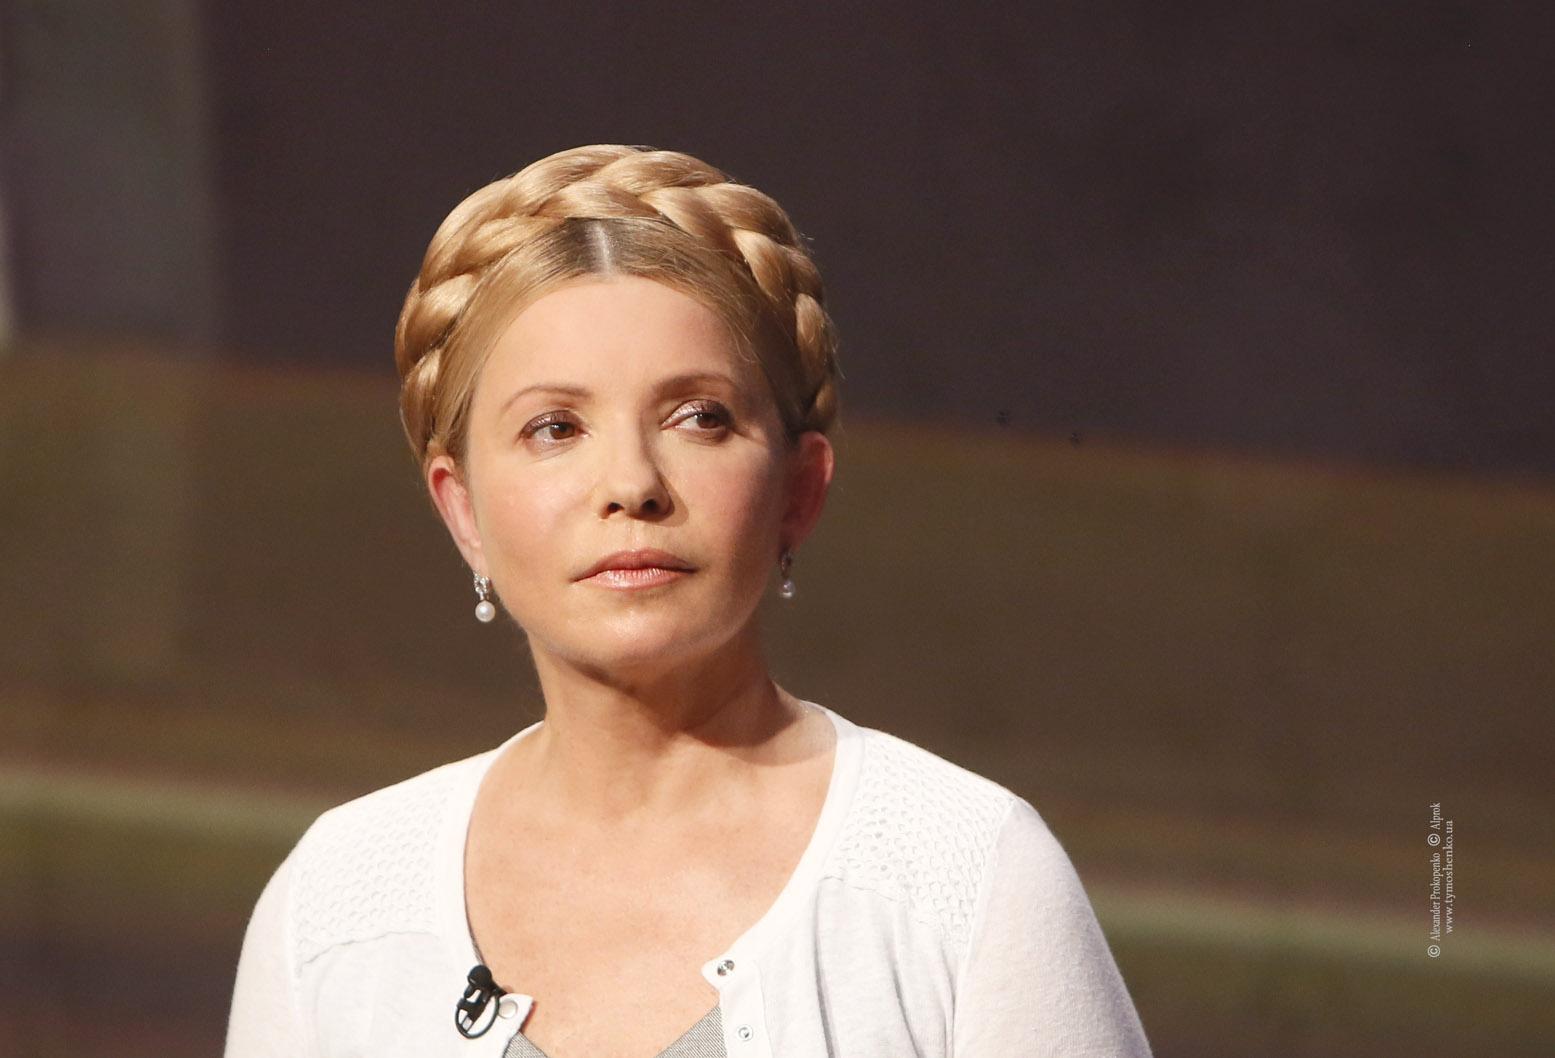 Юлия темошенко трахаеца 14 фотография